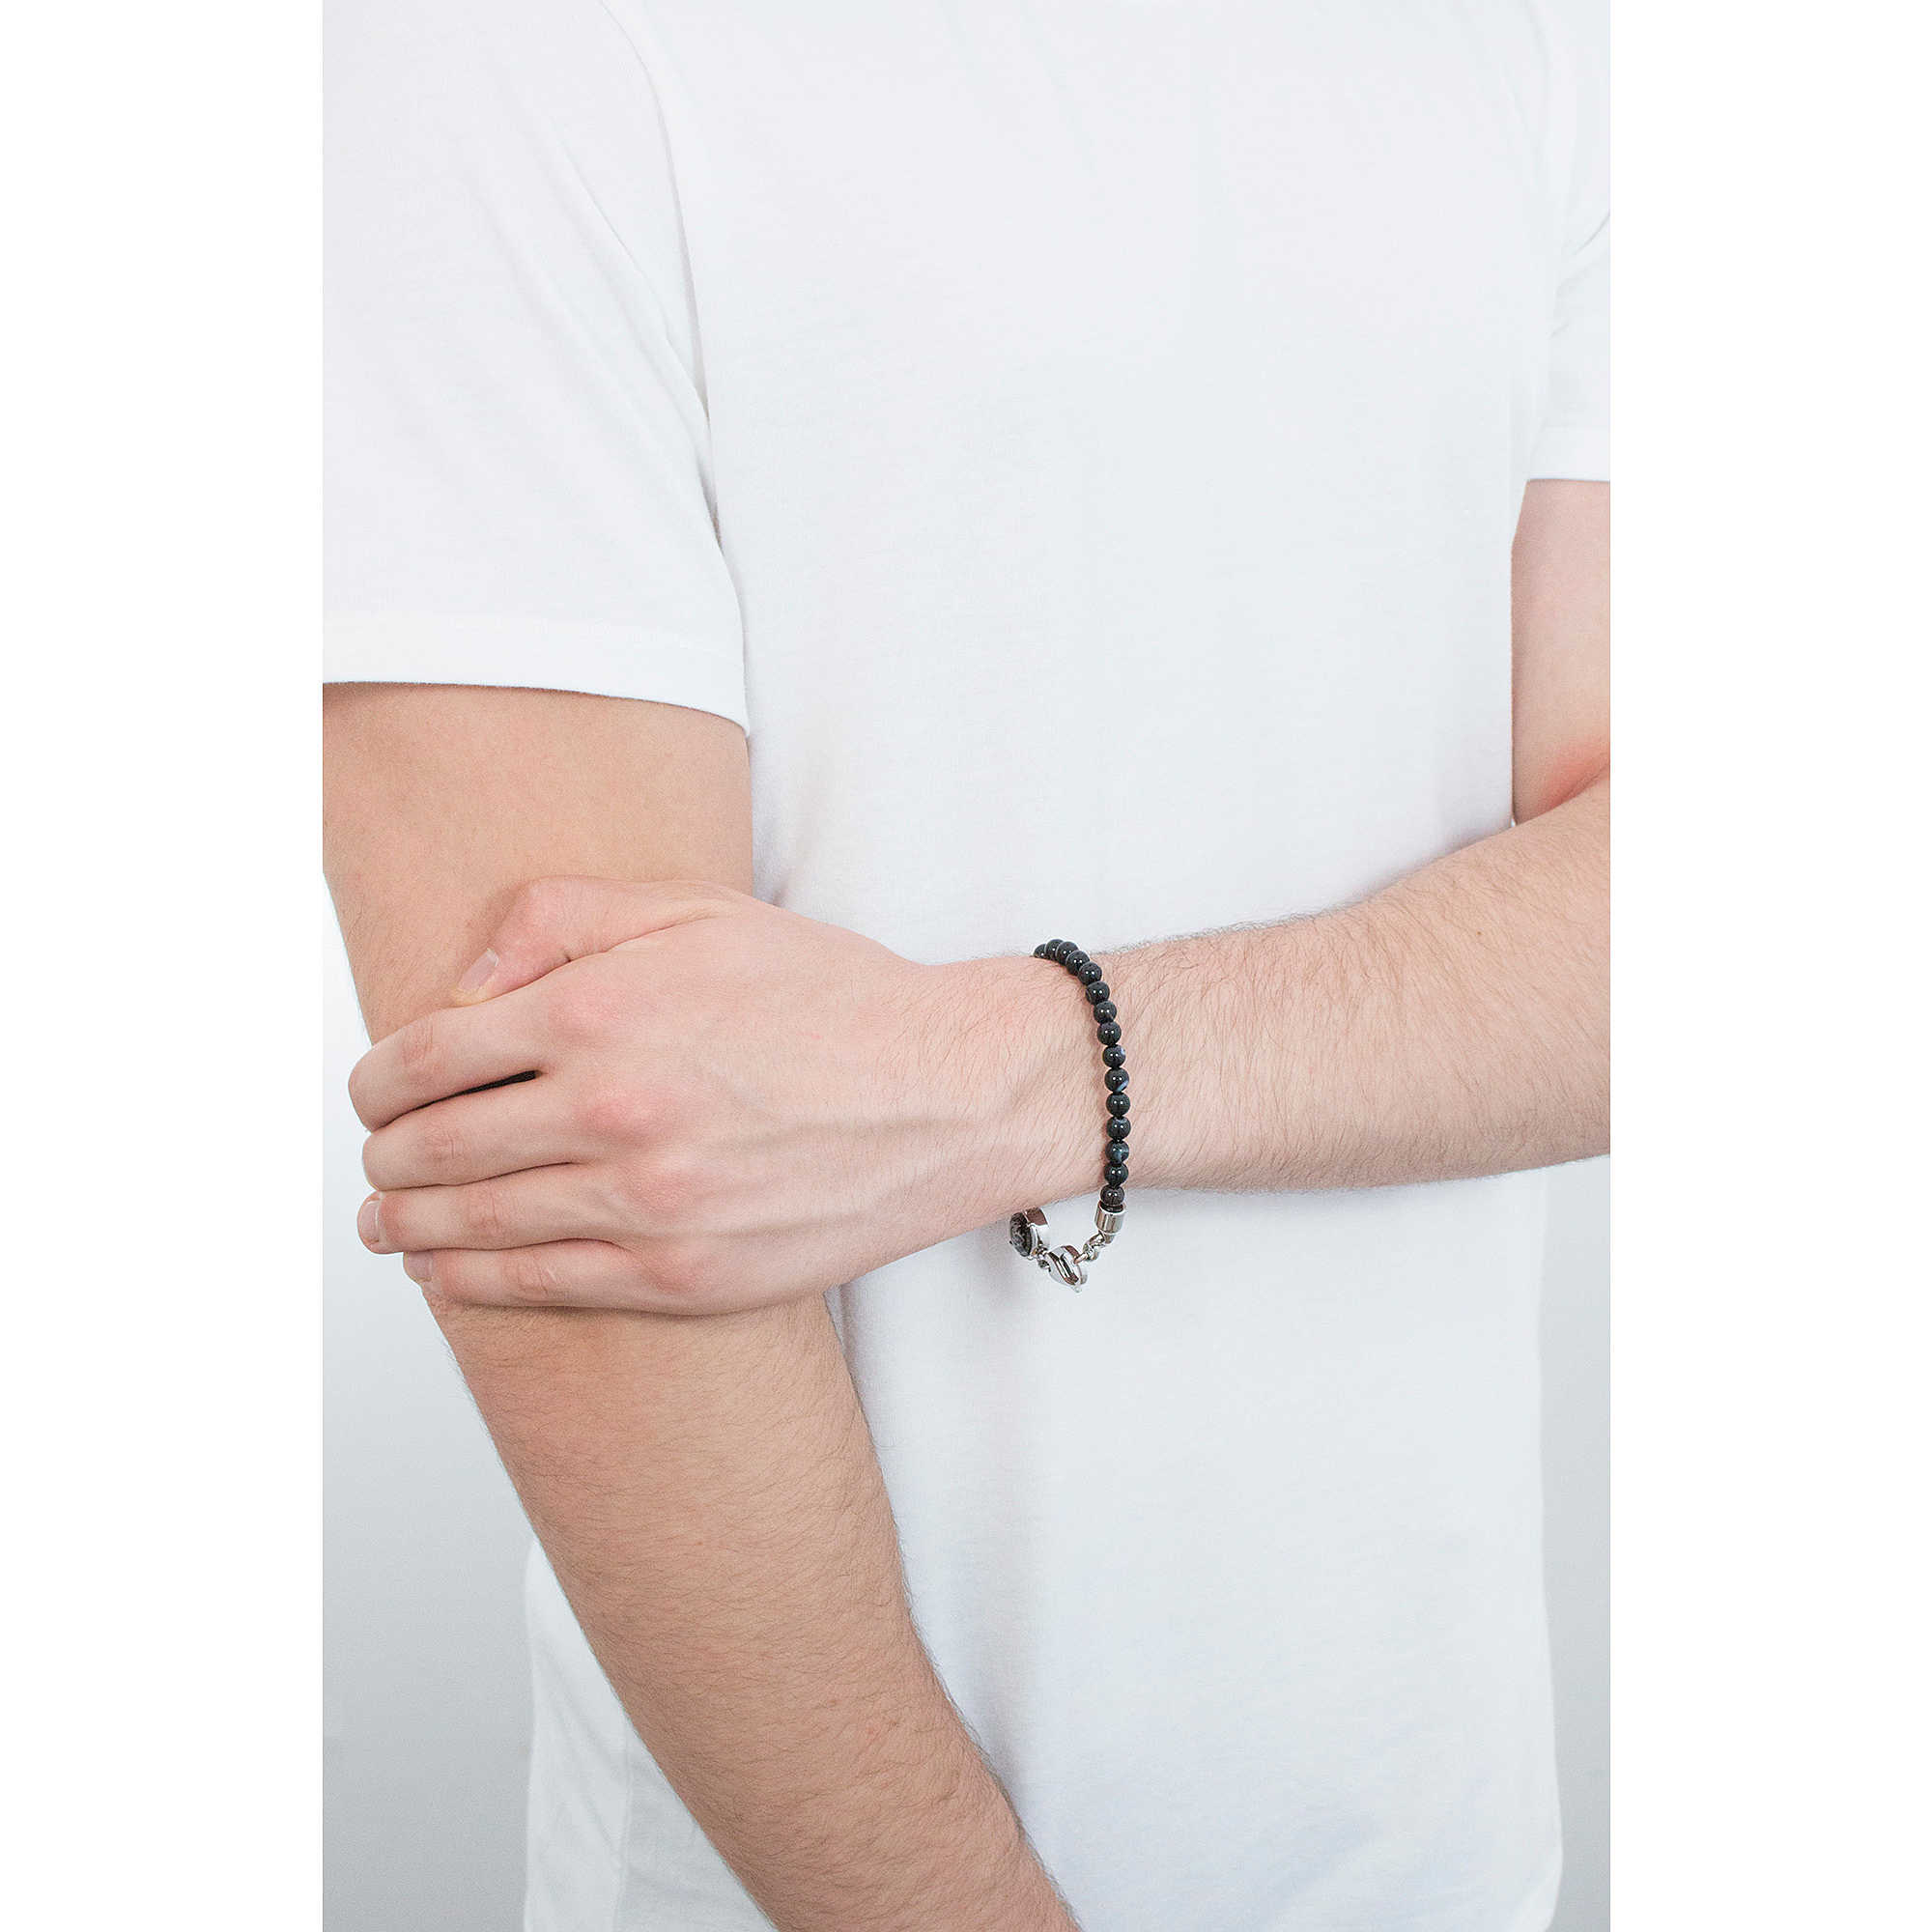 bracelet man jewellery Diesel Beads DX0848040. zoom. Diesel bracelets Beads  man DX0848040 photo wearing. zoom f319135744fa